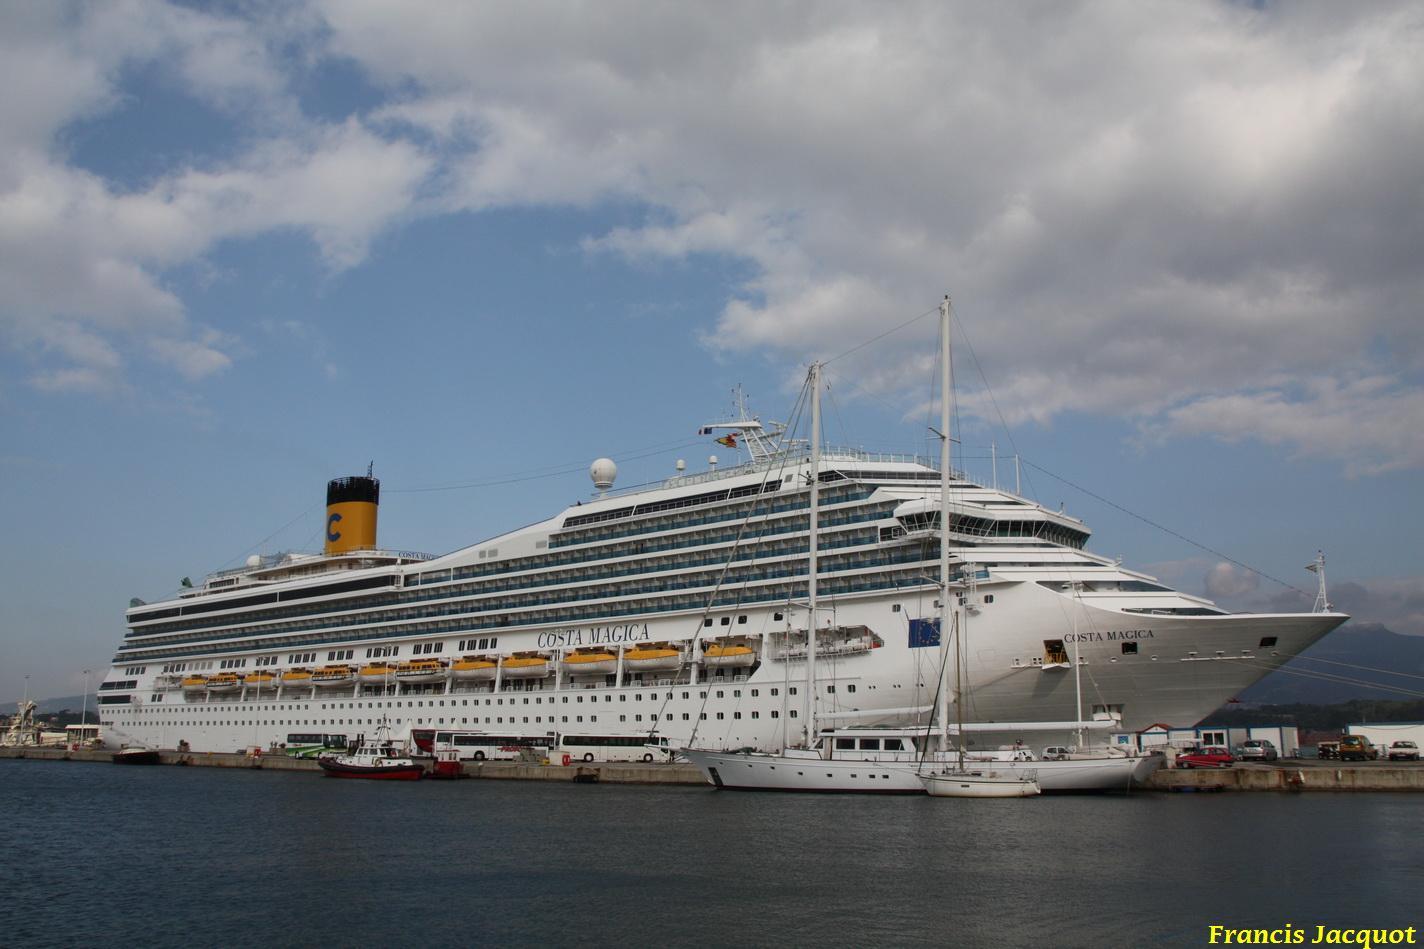 Le Costa Magica en escale à La Seyne sur Mer 1011